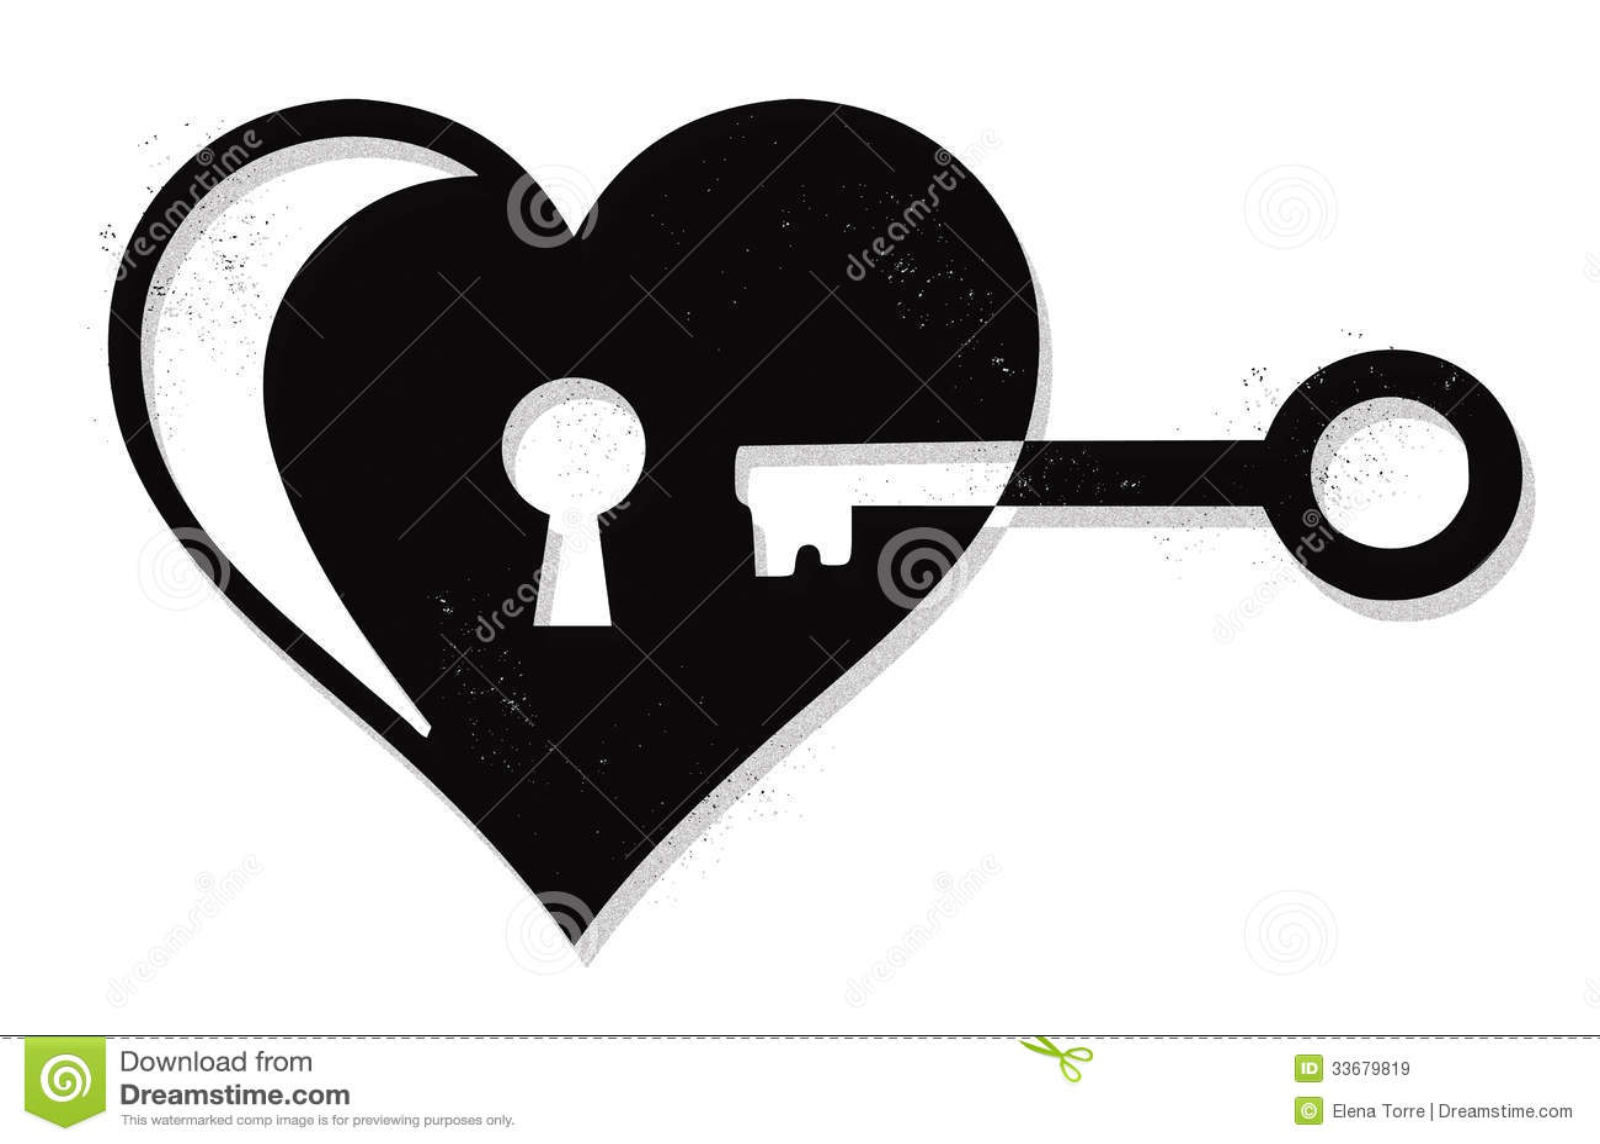 Vector Key Illustration: Heart Lock And Key Vector Stock Vector. Illustration Of